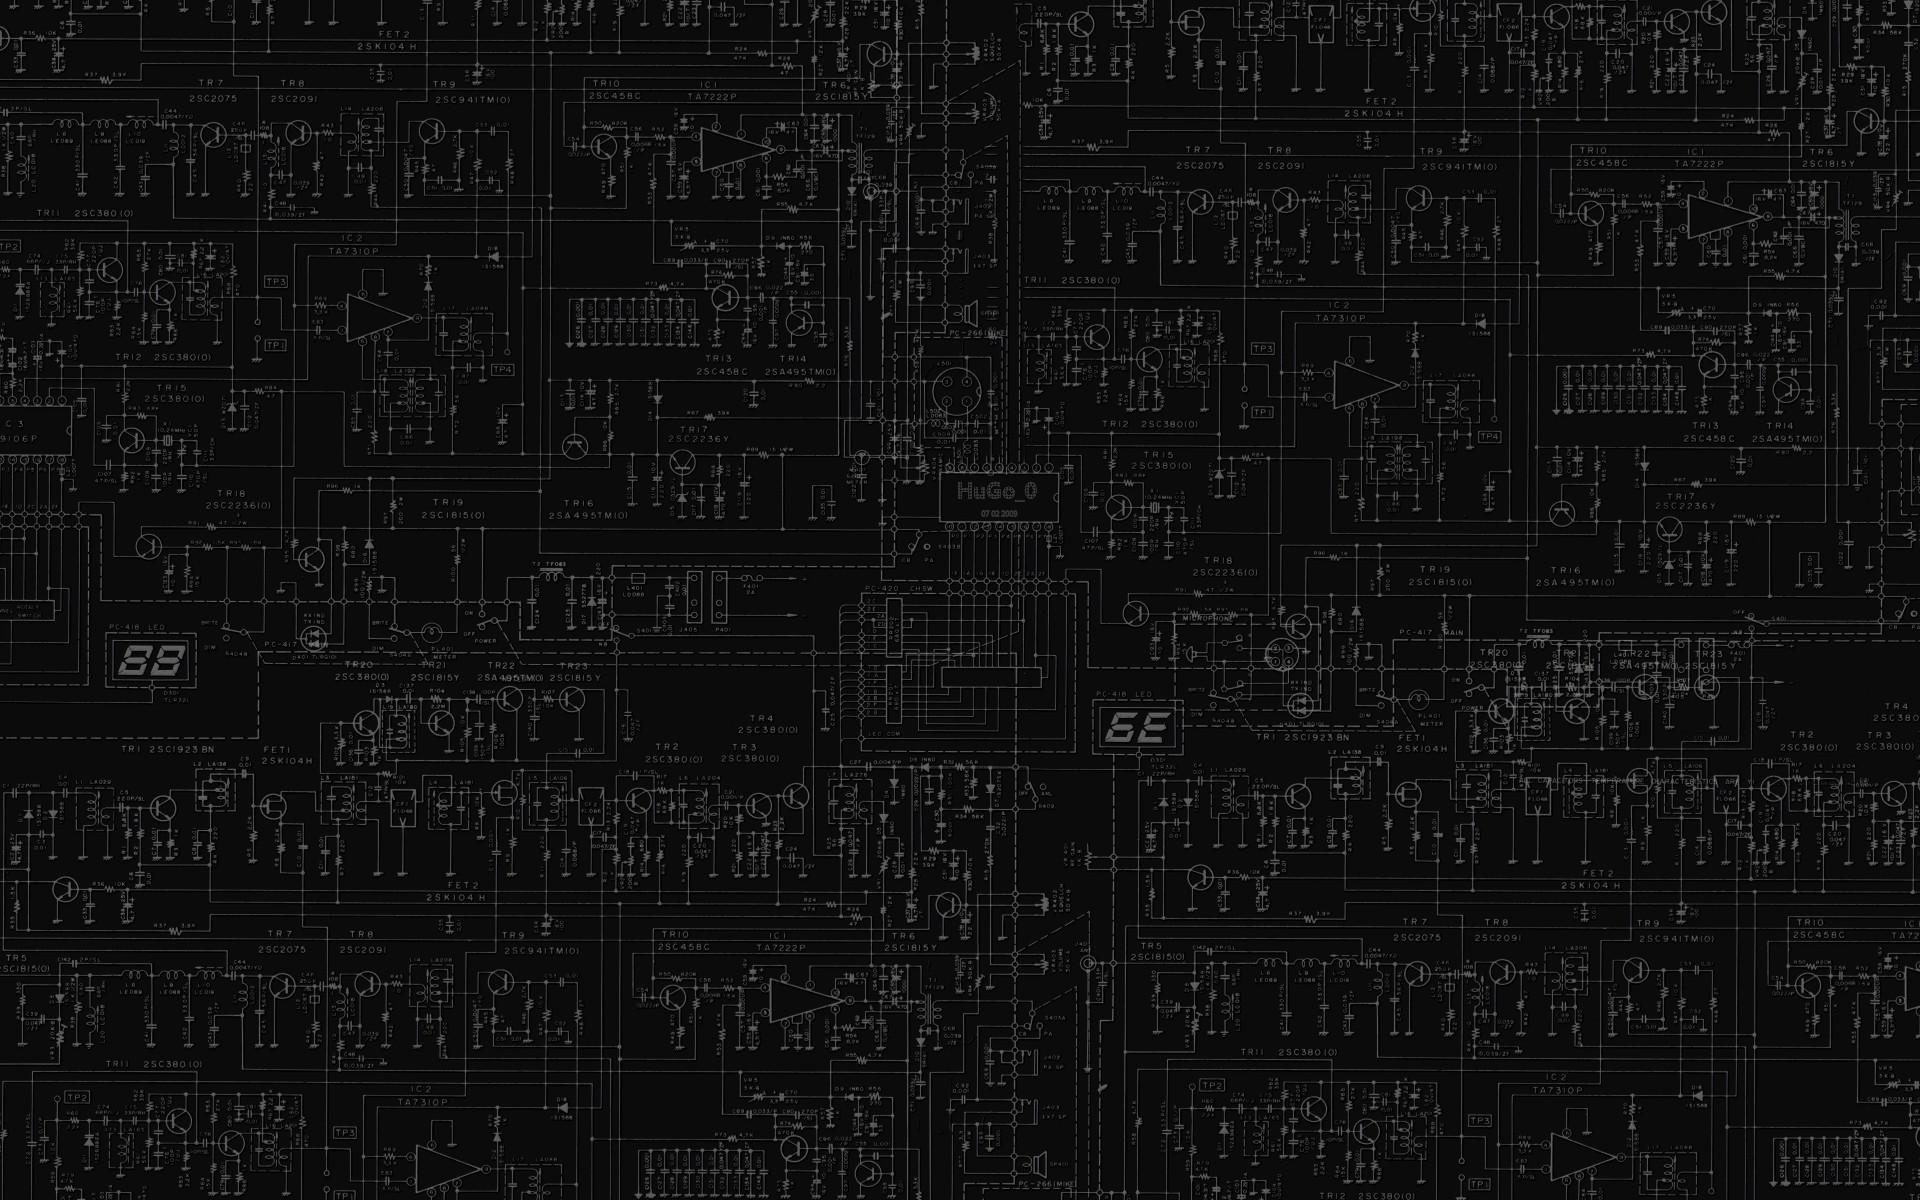 schematic_wallpaper_1920_by_HuGo07.jpg.